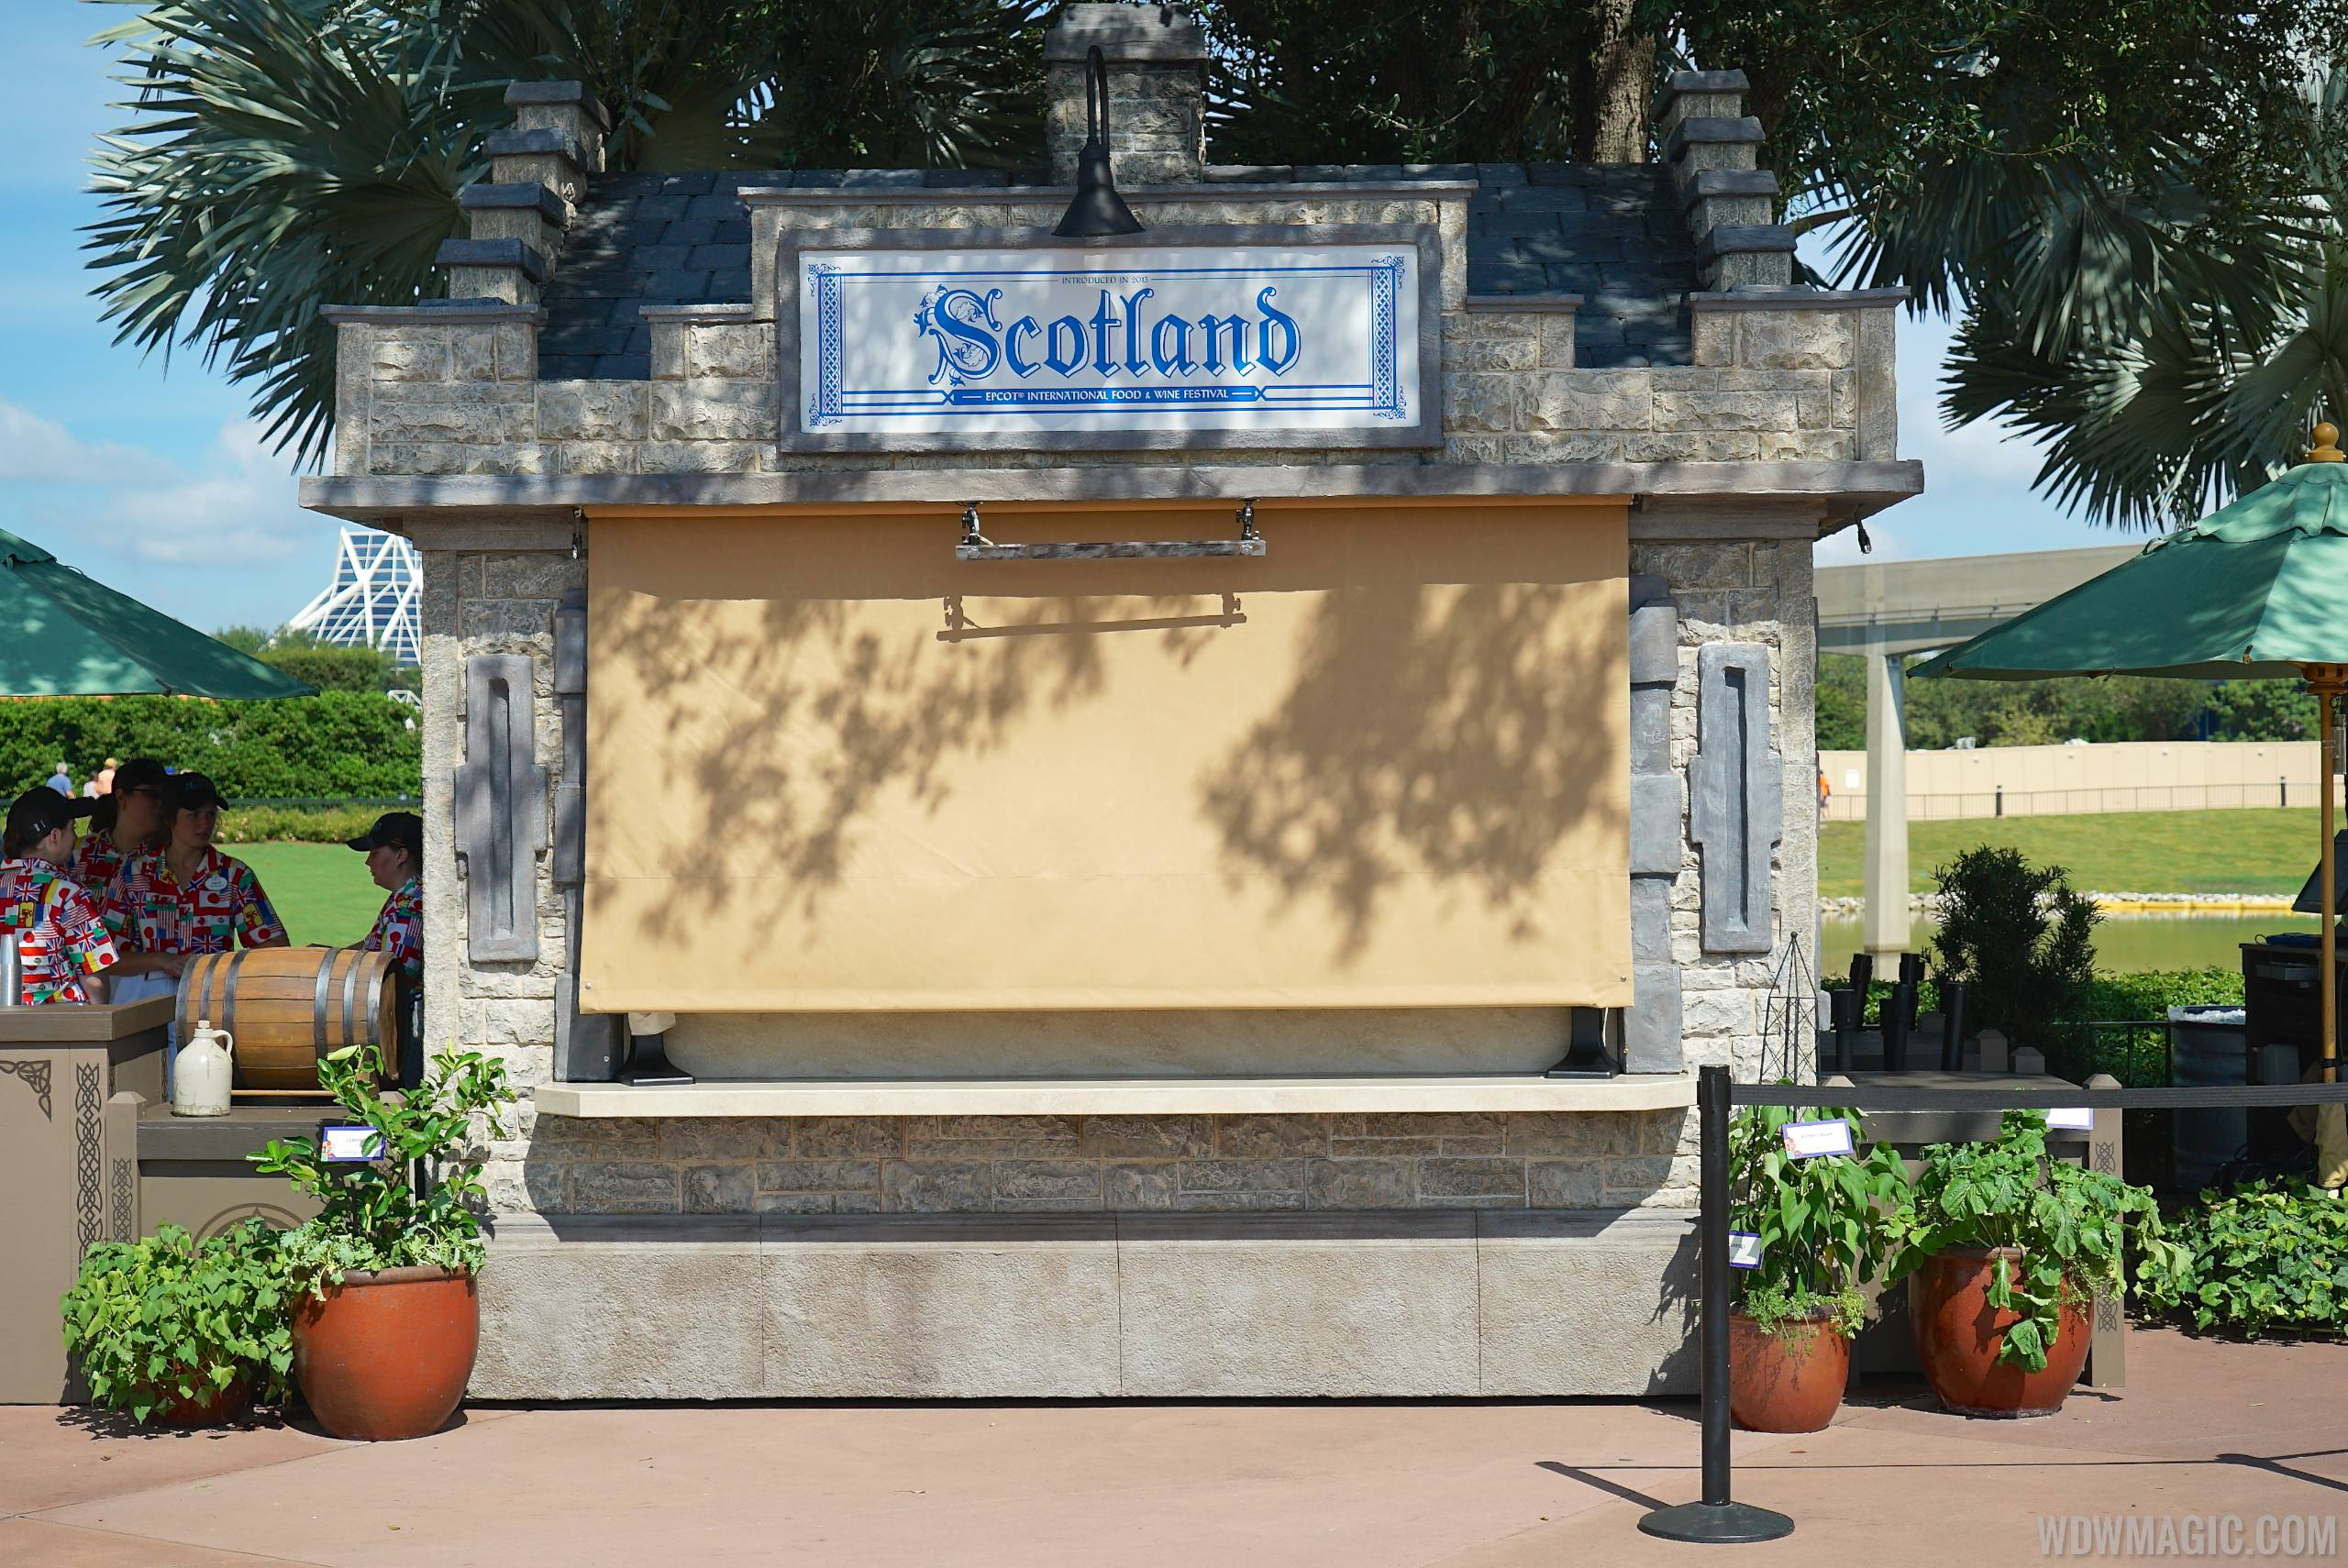 Scotland kiosk